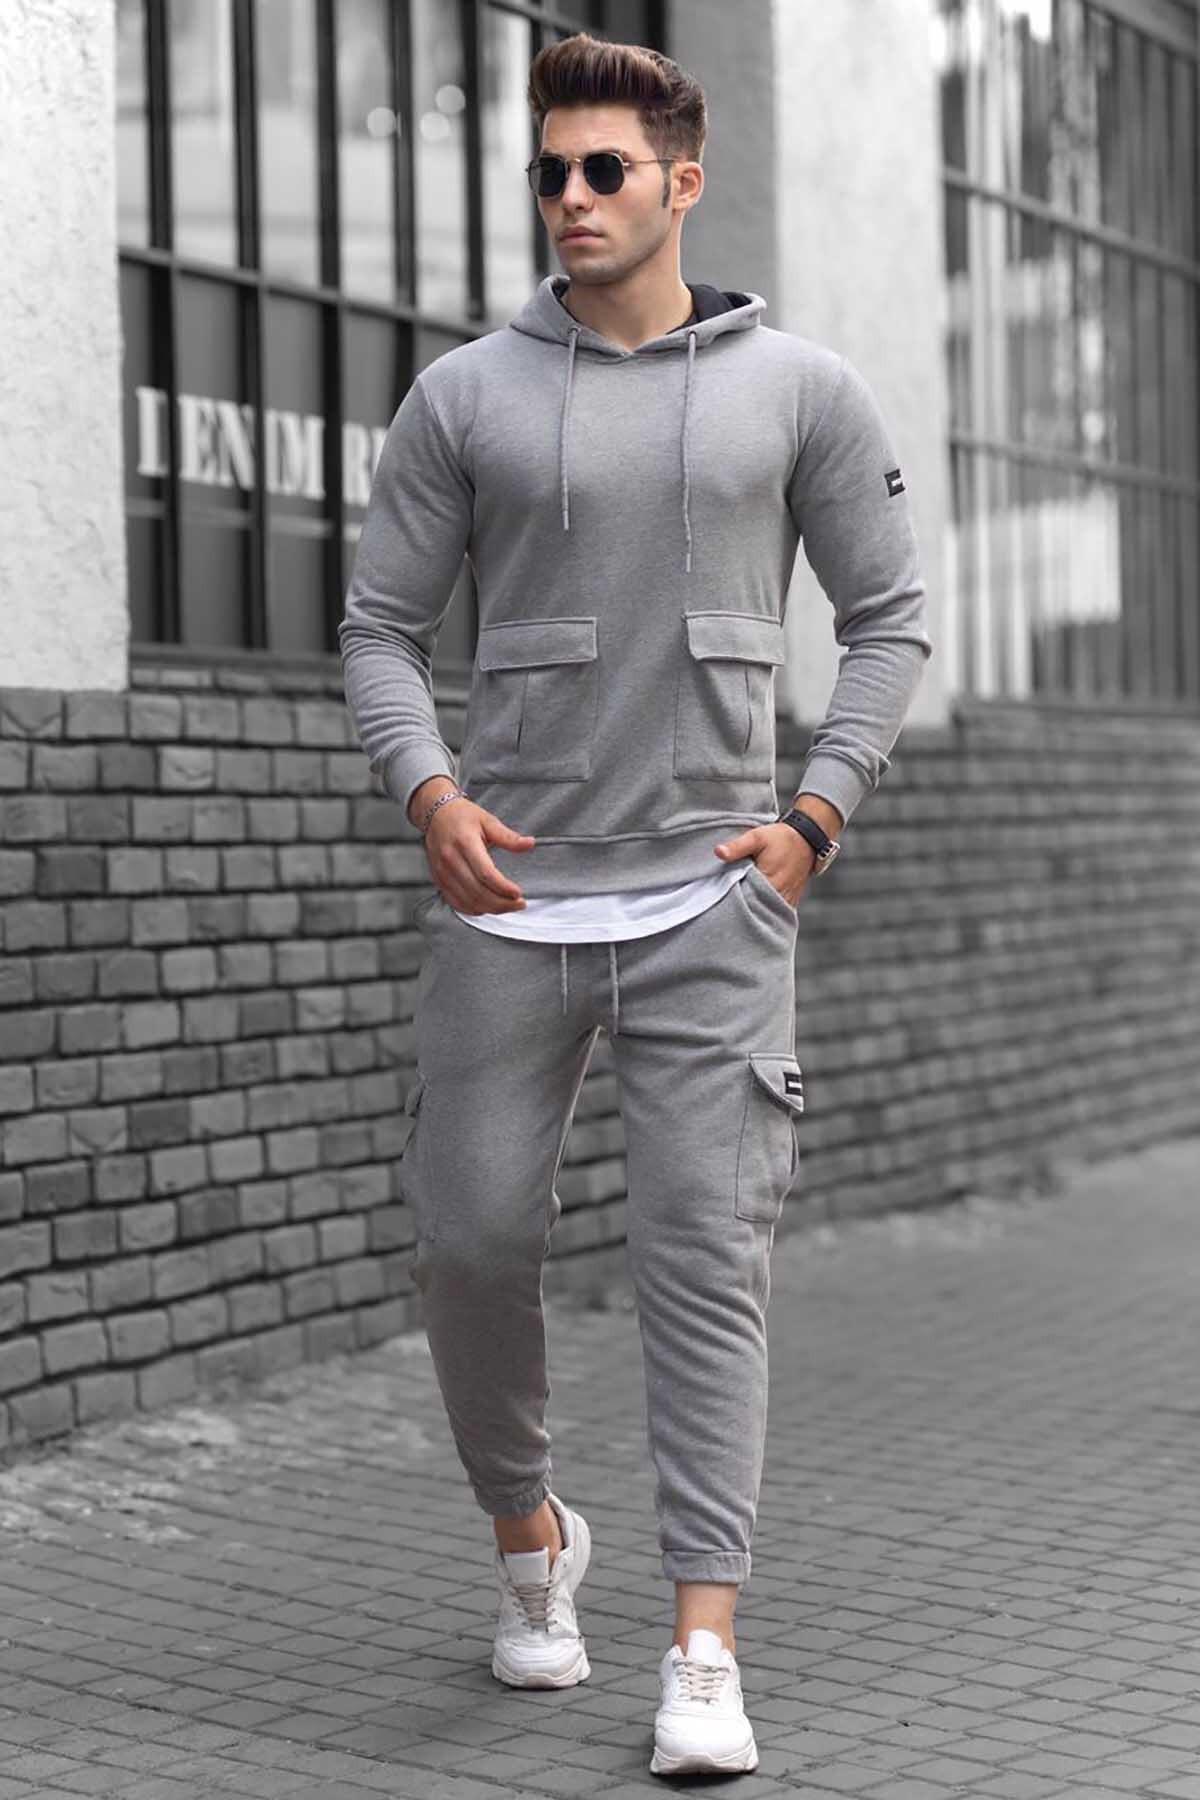 Gray Pocket Detailed Men's Sweatshirt Tracksuit Set 2021 New Season Cotton Polyester Fabric 2 Pieces